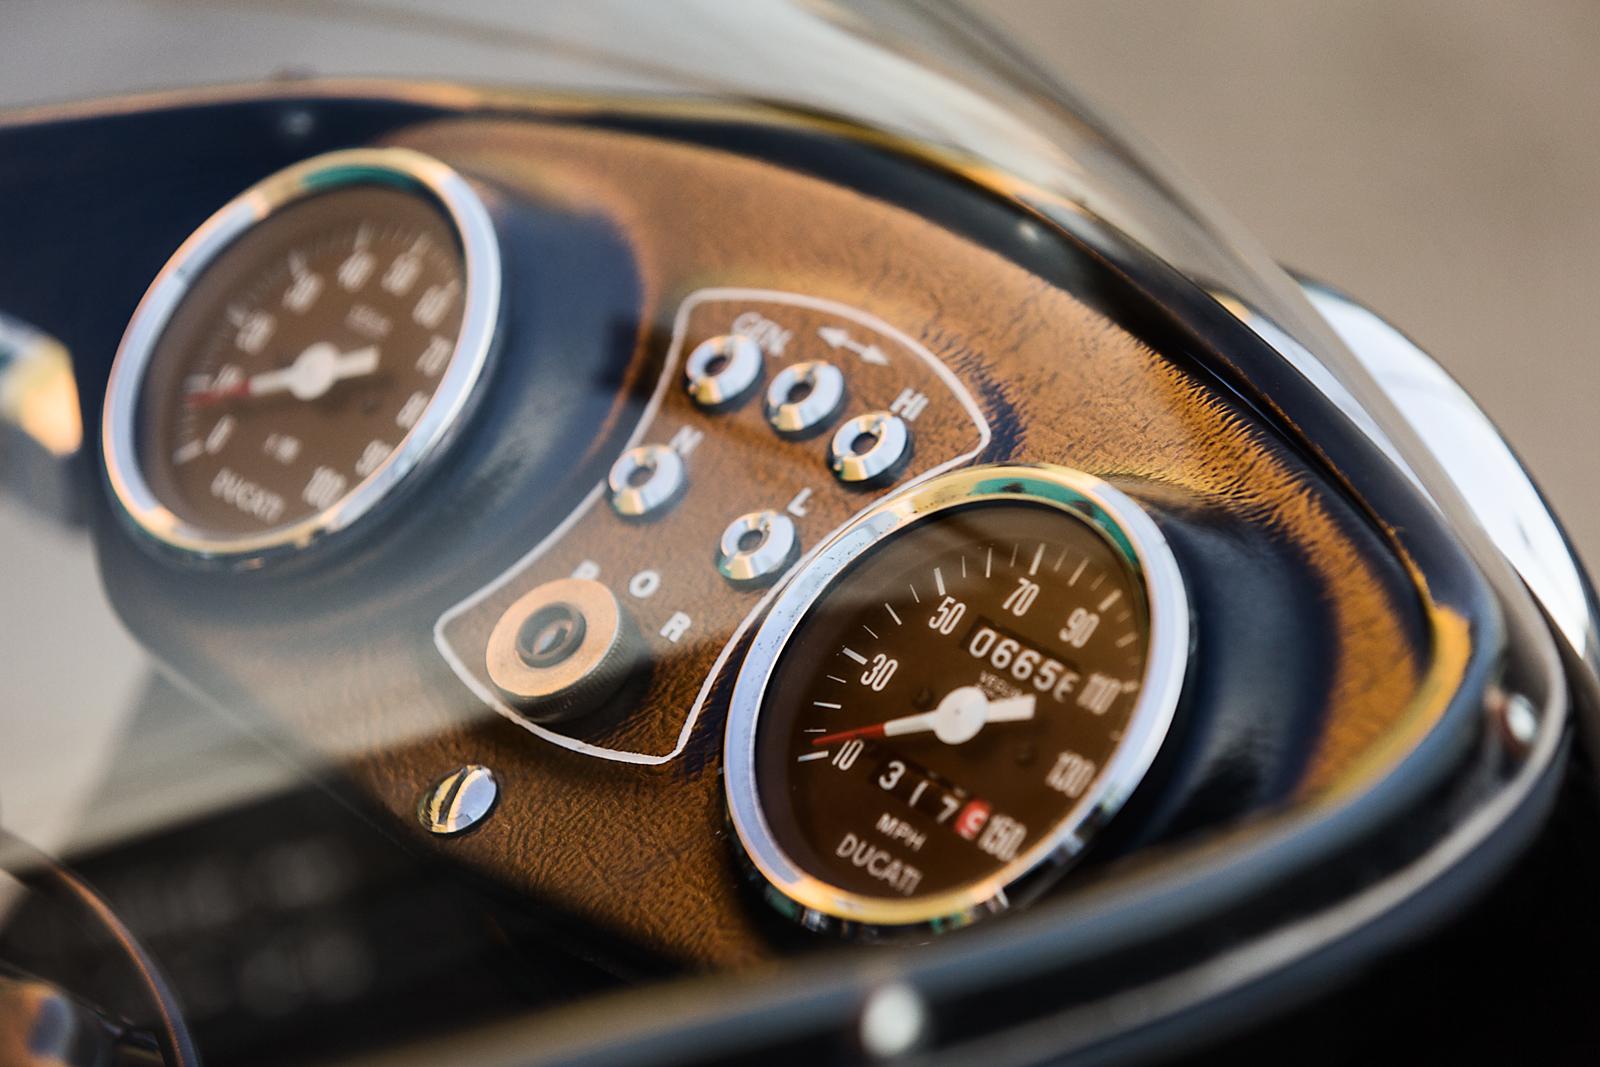 1979 Ducati 900SS gauges